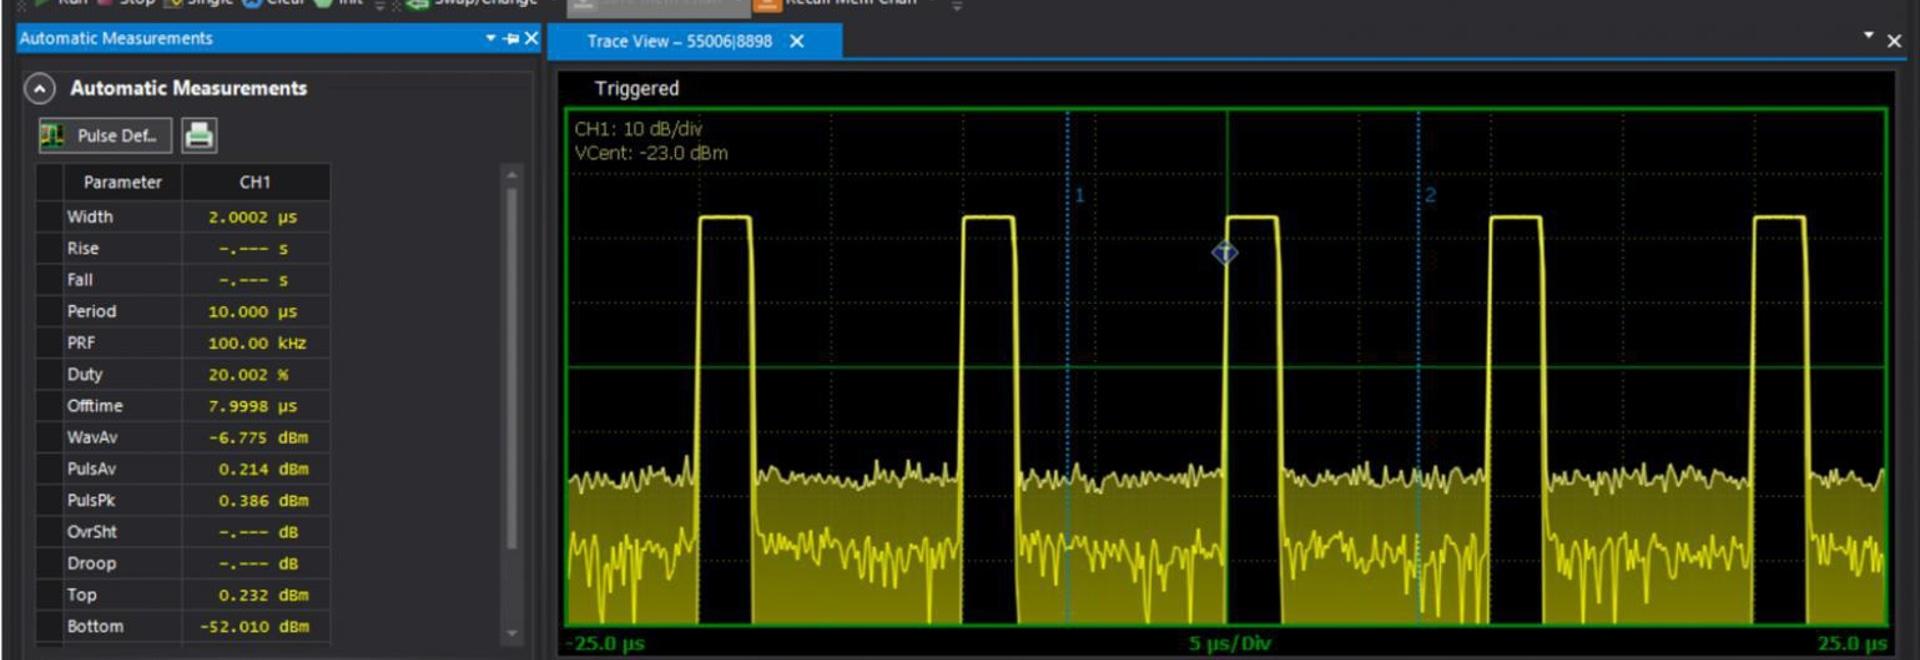 Peak Power Sensors Offer More than Meets the Eye